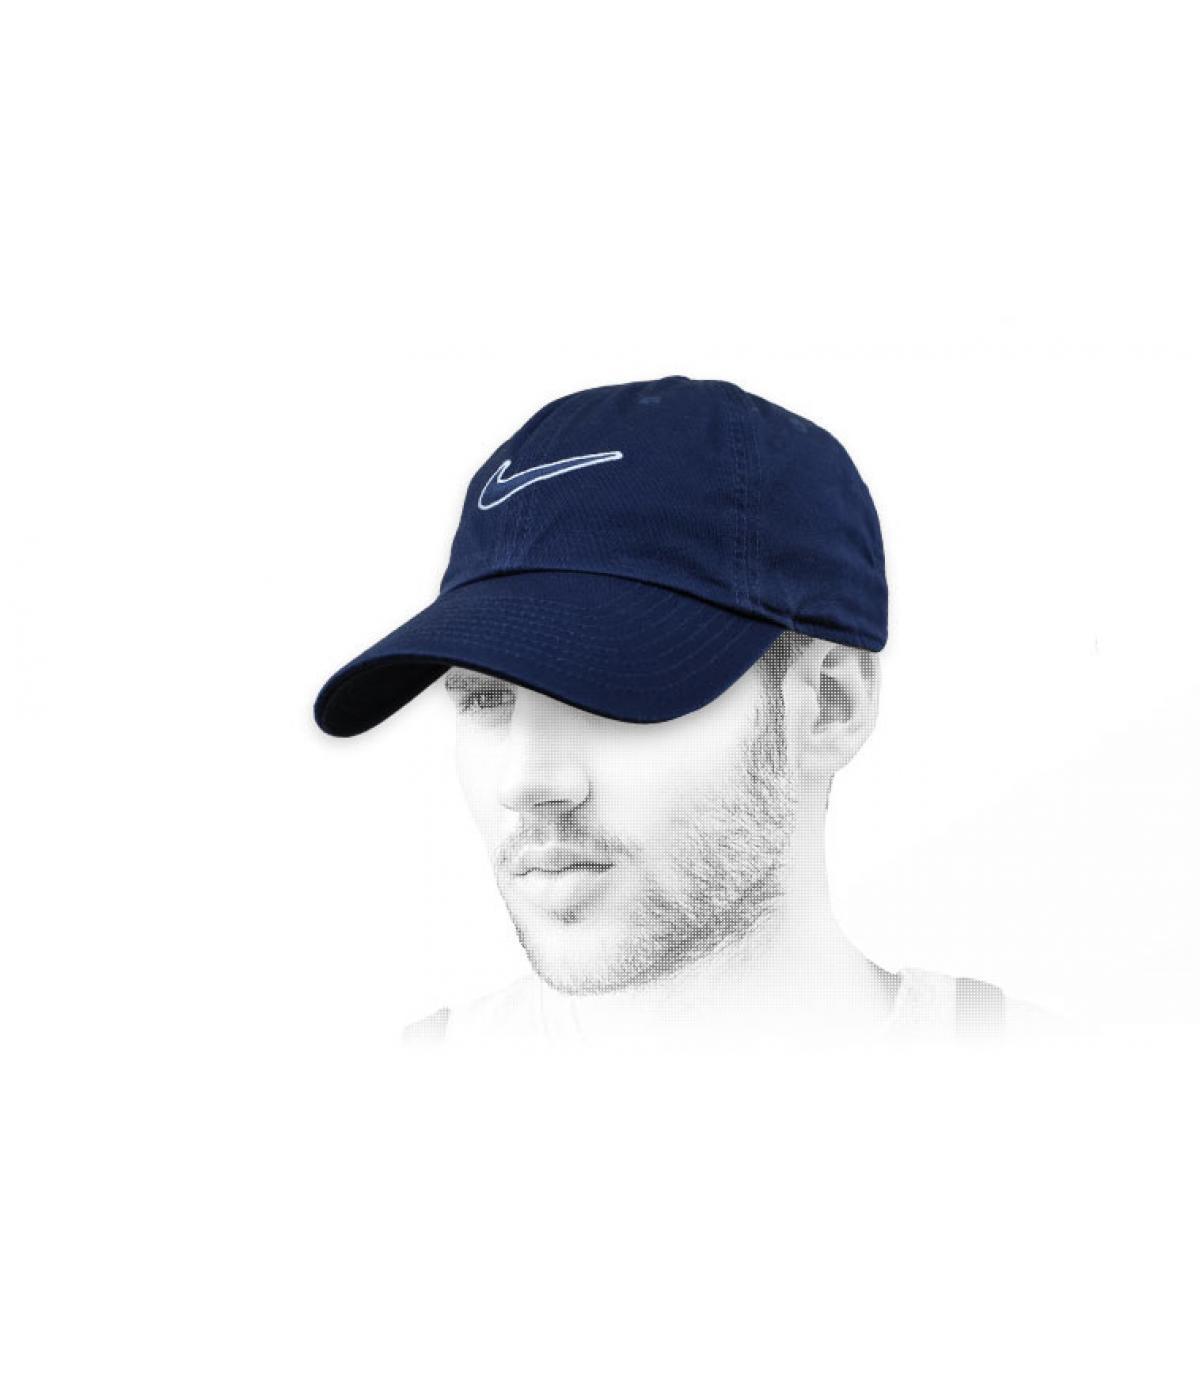 Cappellino Nike nero swoosh